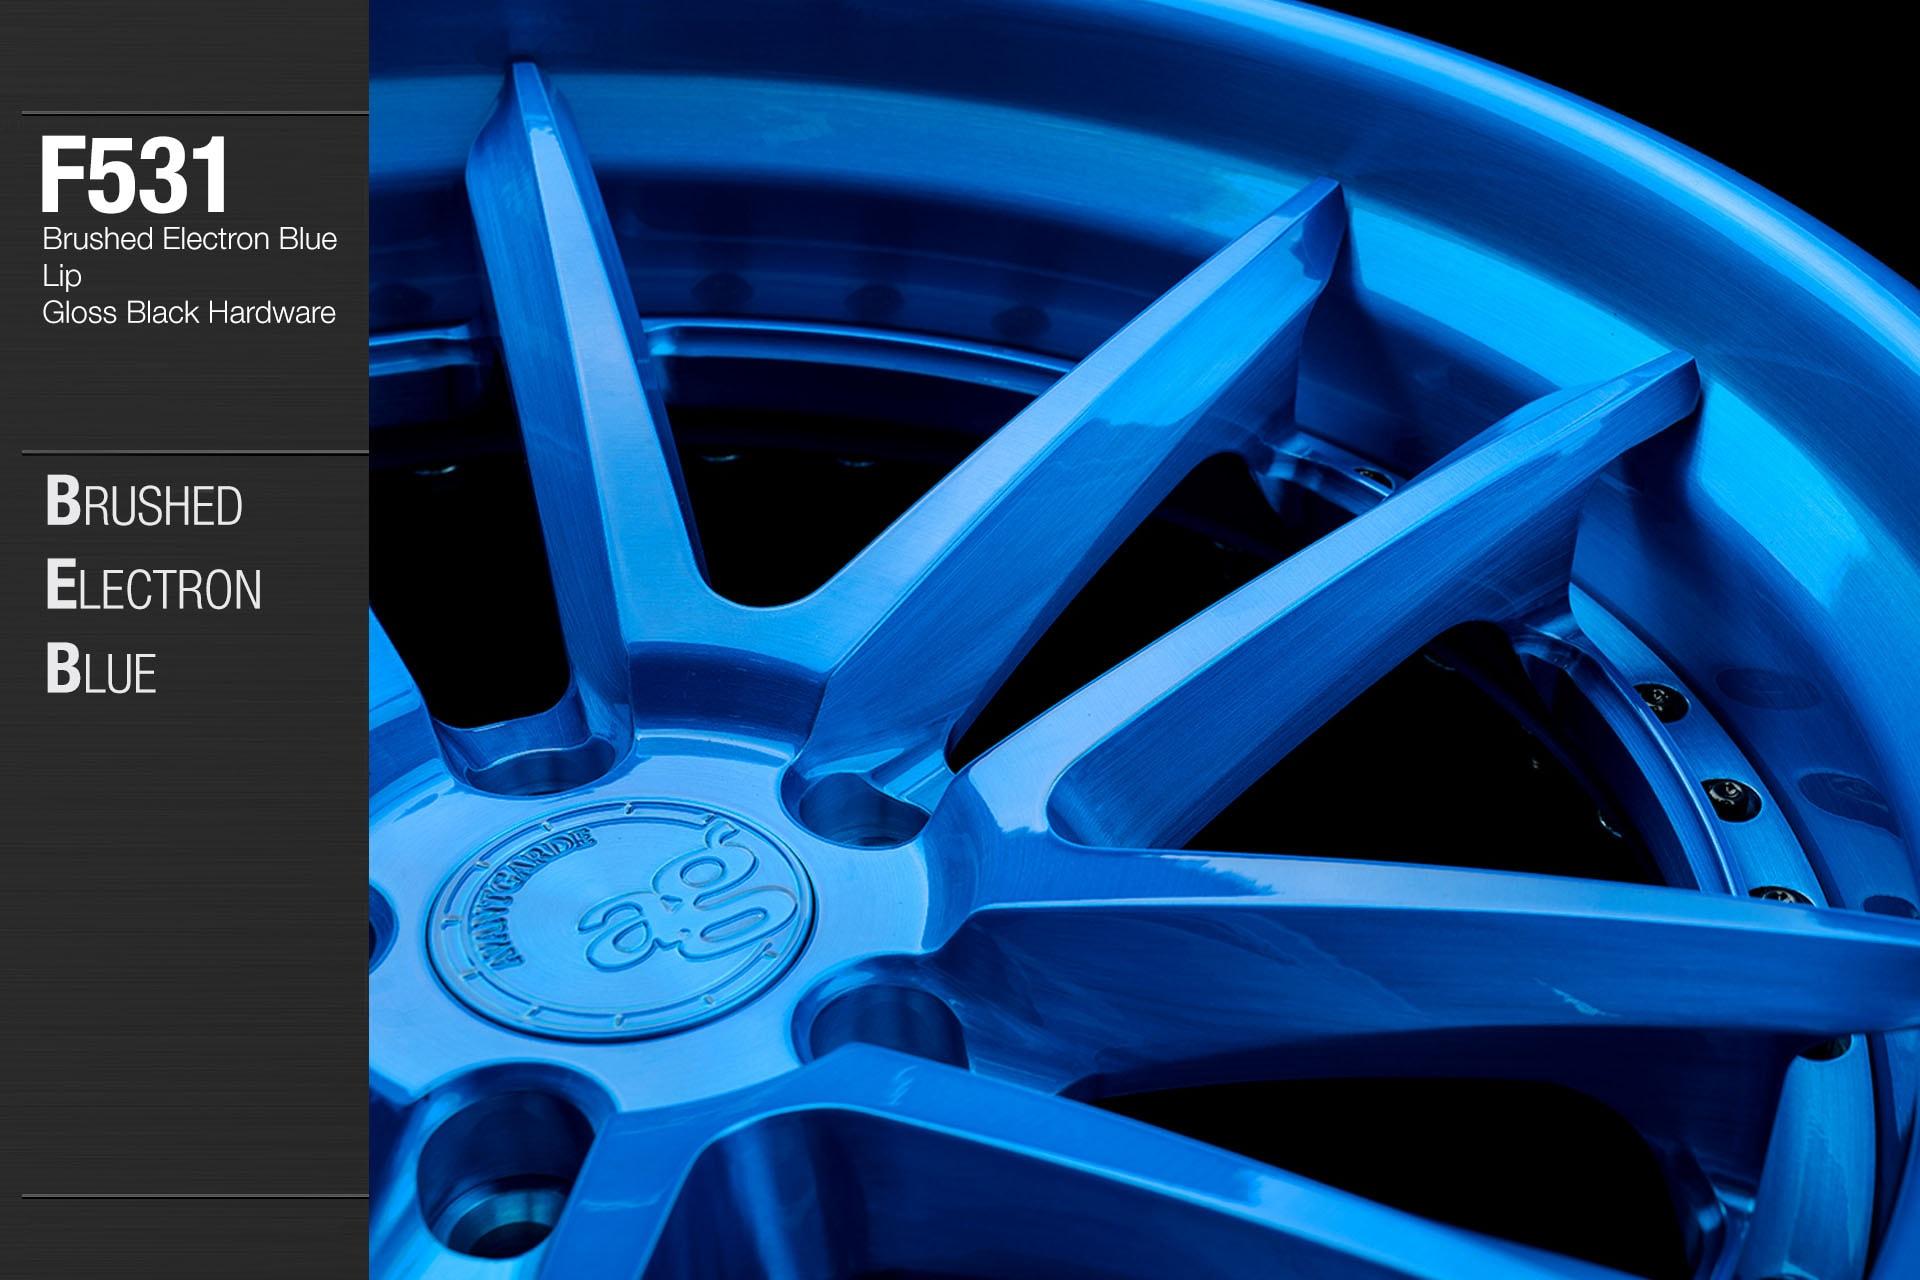 avant-garde-ag-wheels-f531-brushed-electron-blue-face-lip-gloss-black-hardware-2-min